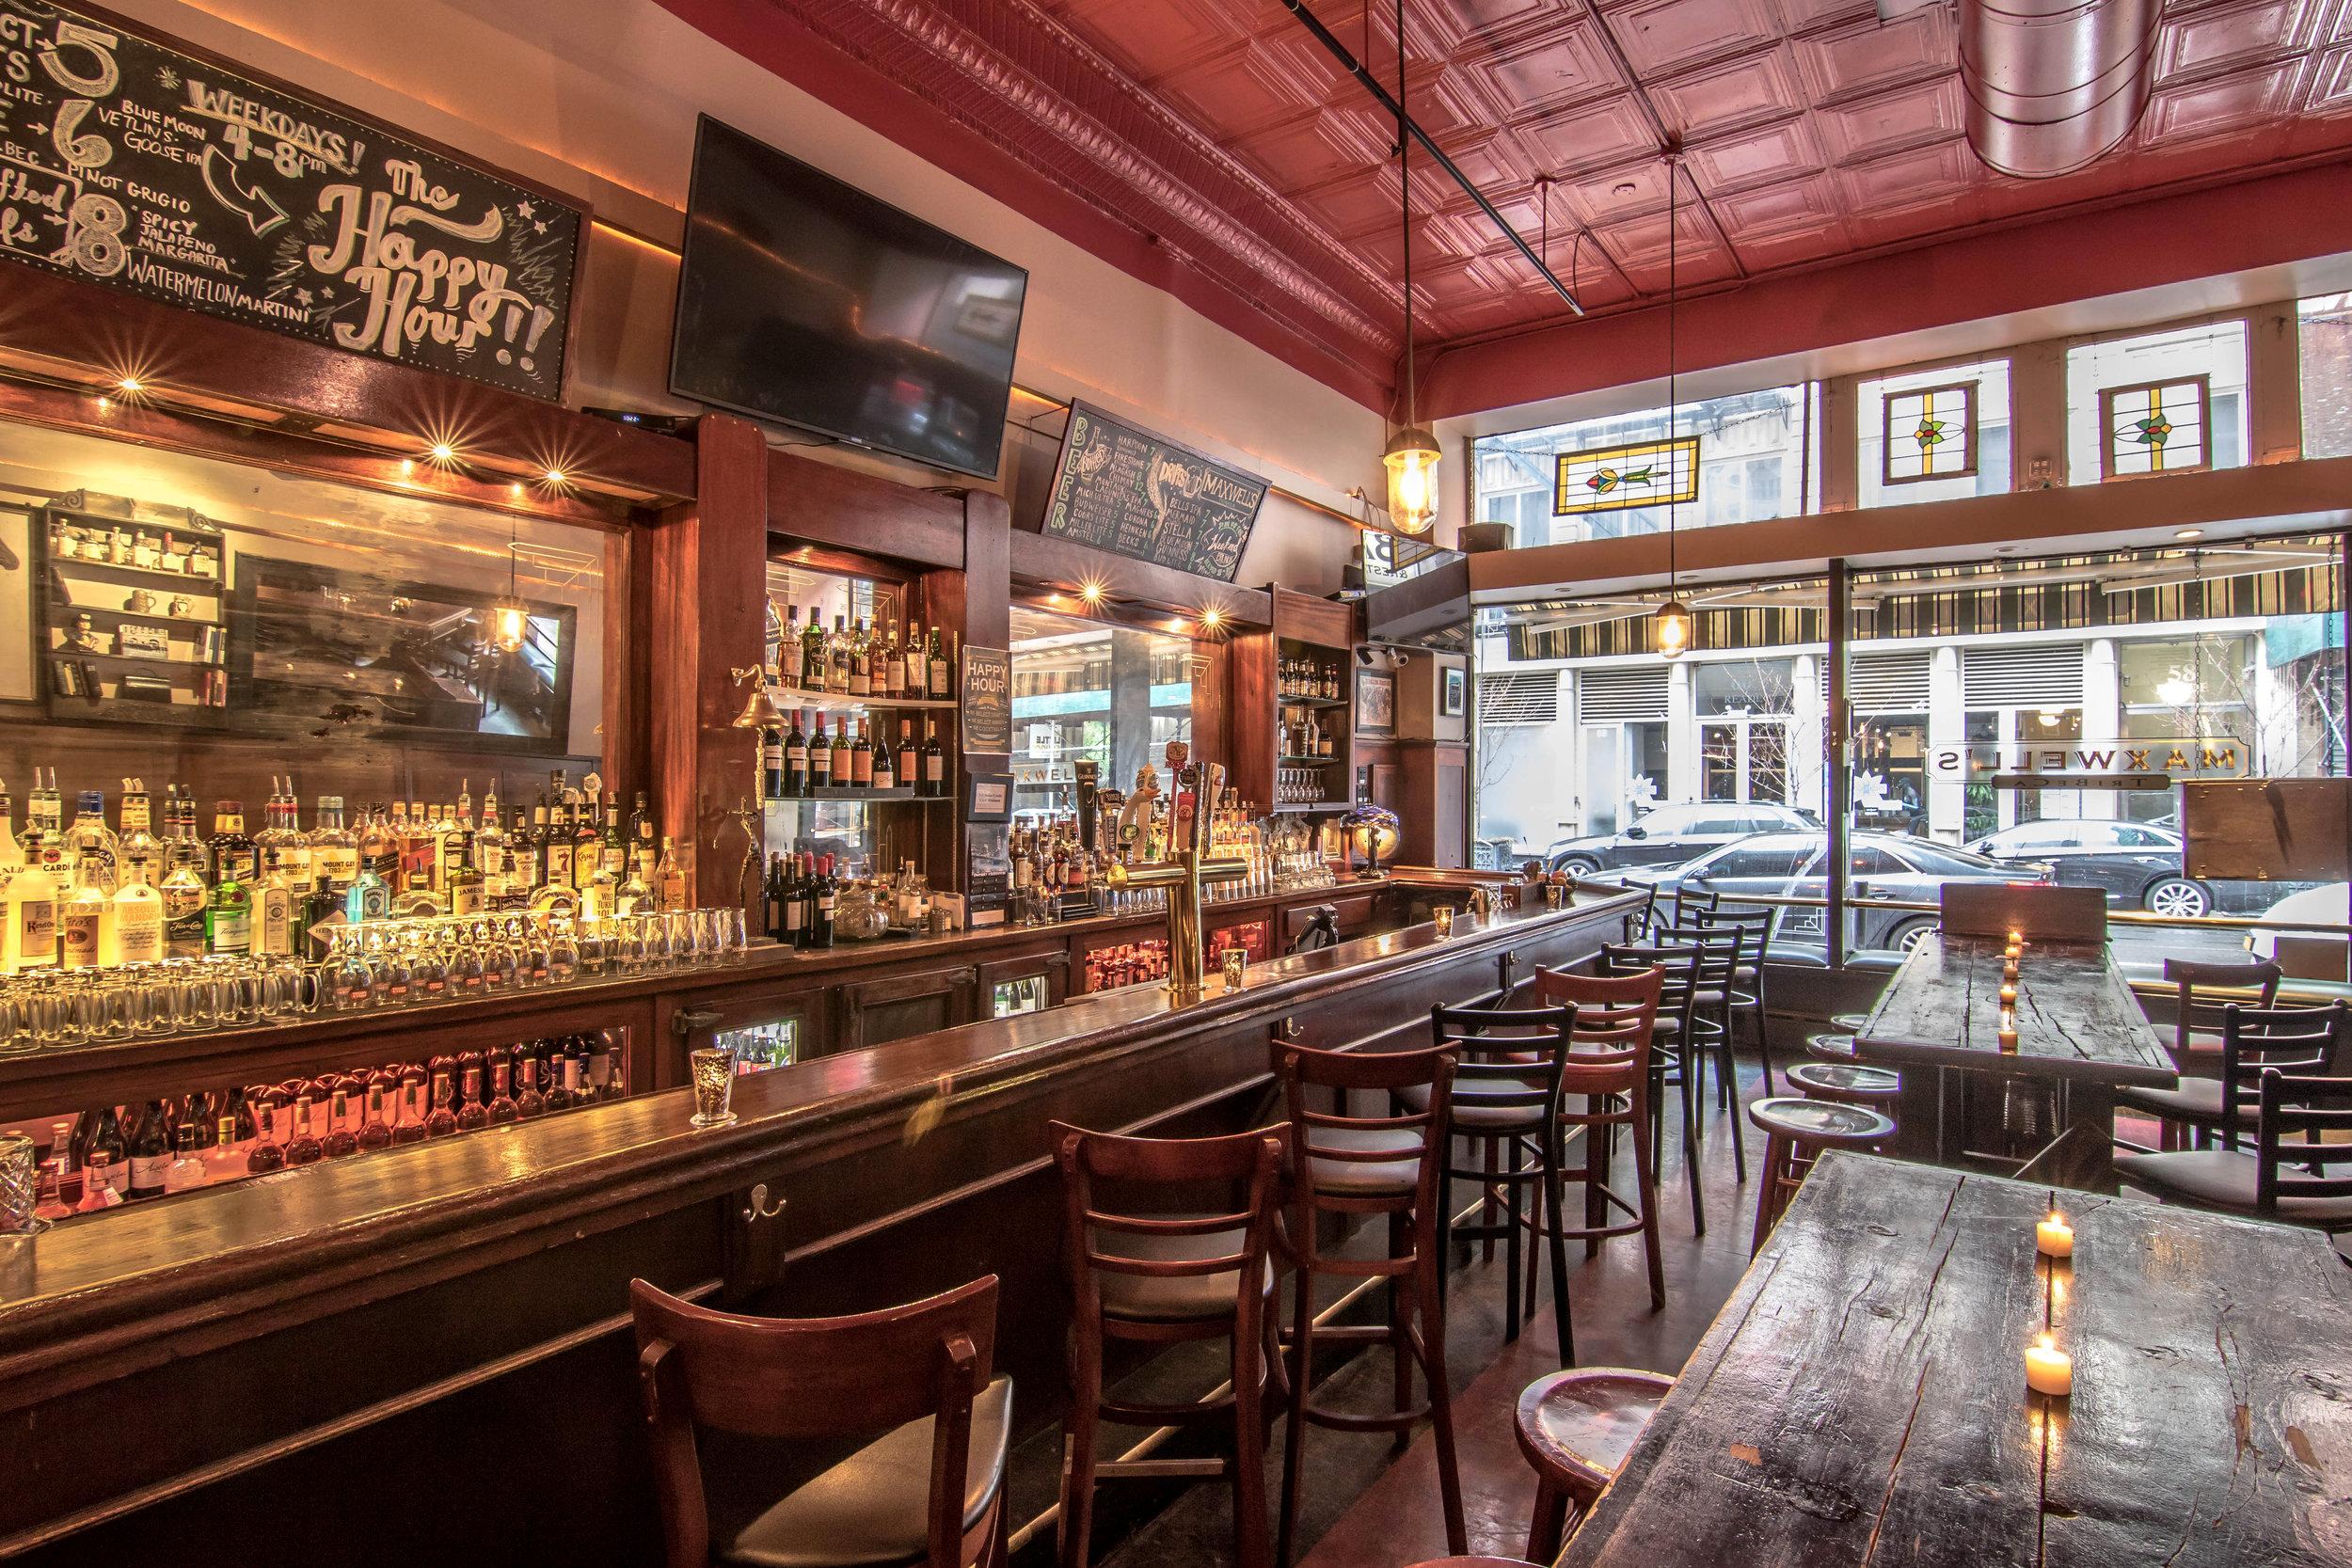 Maxwells bar & restaurant best restaurants tribeca lunch spots